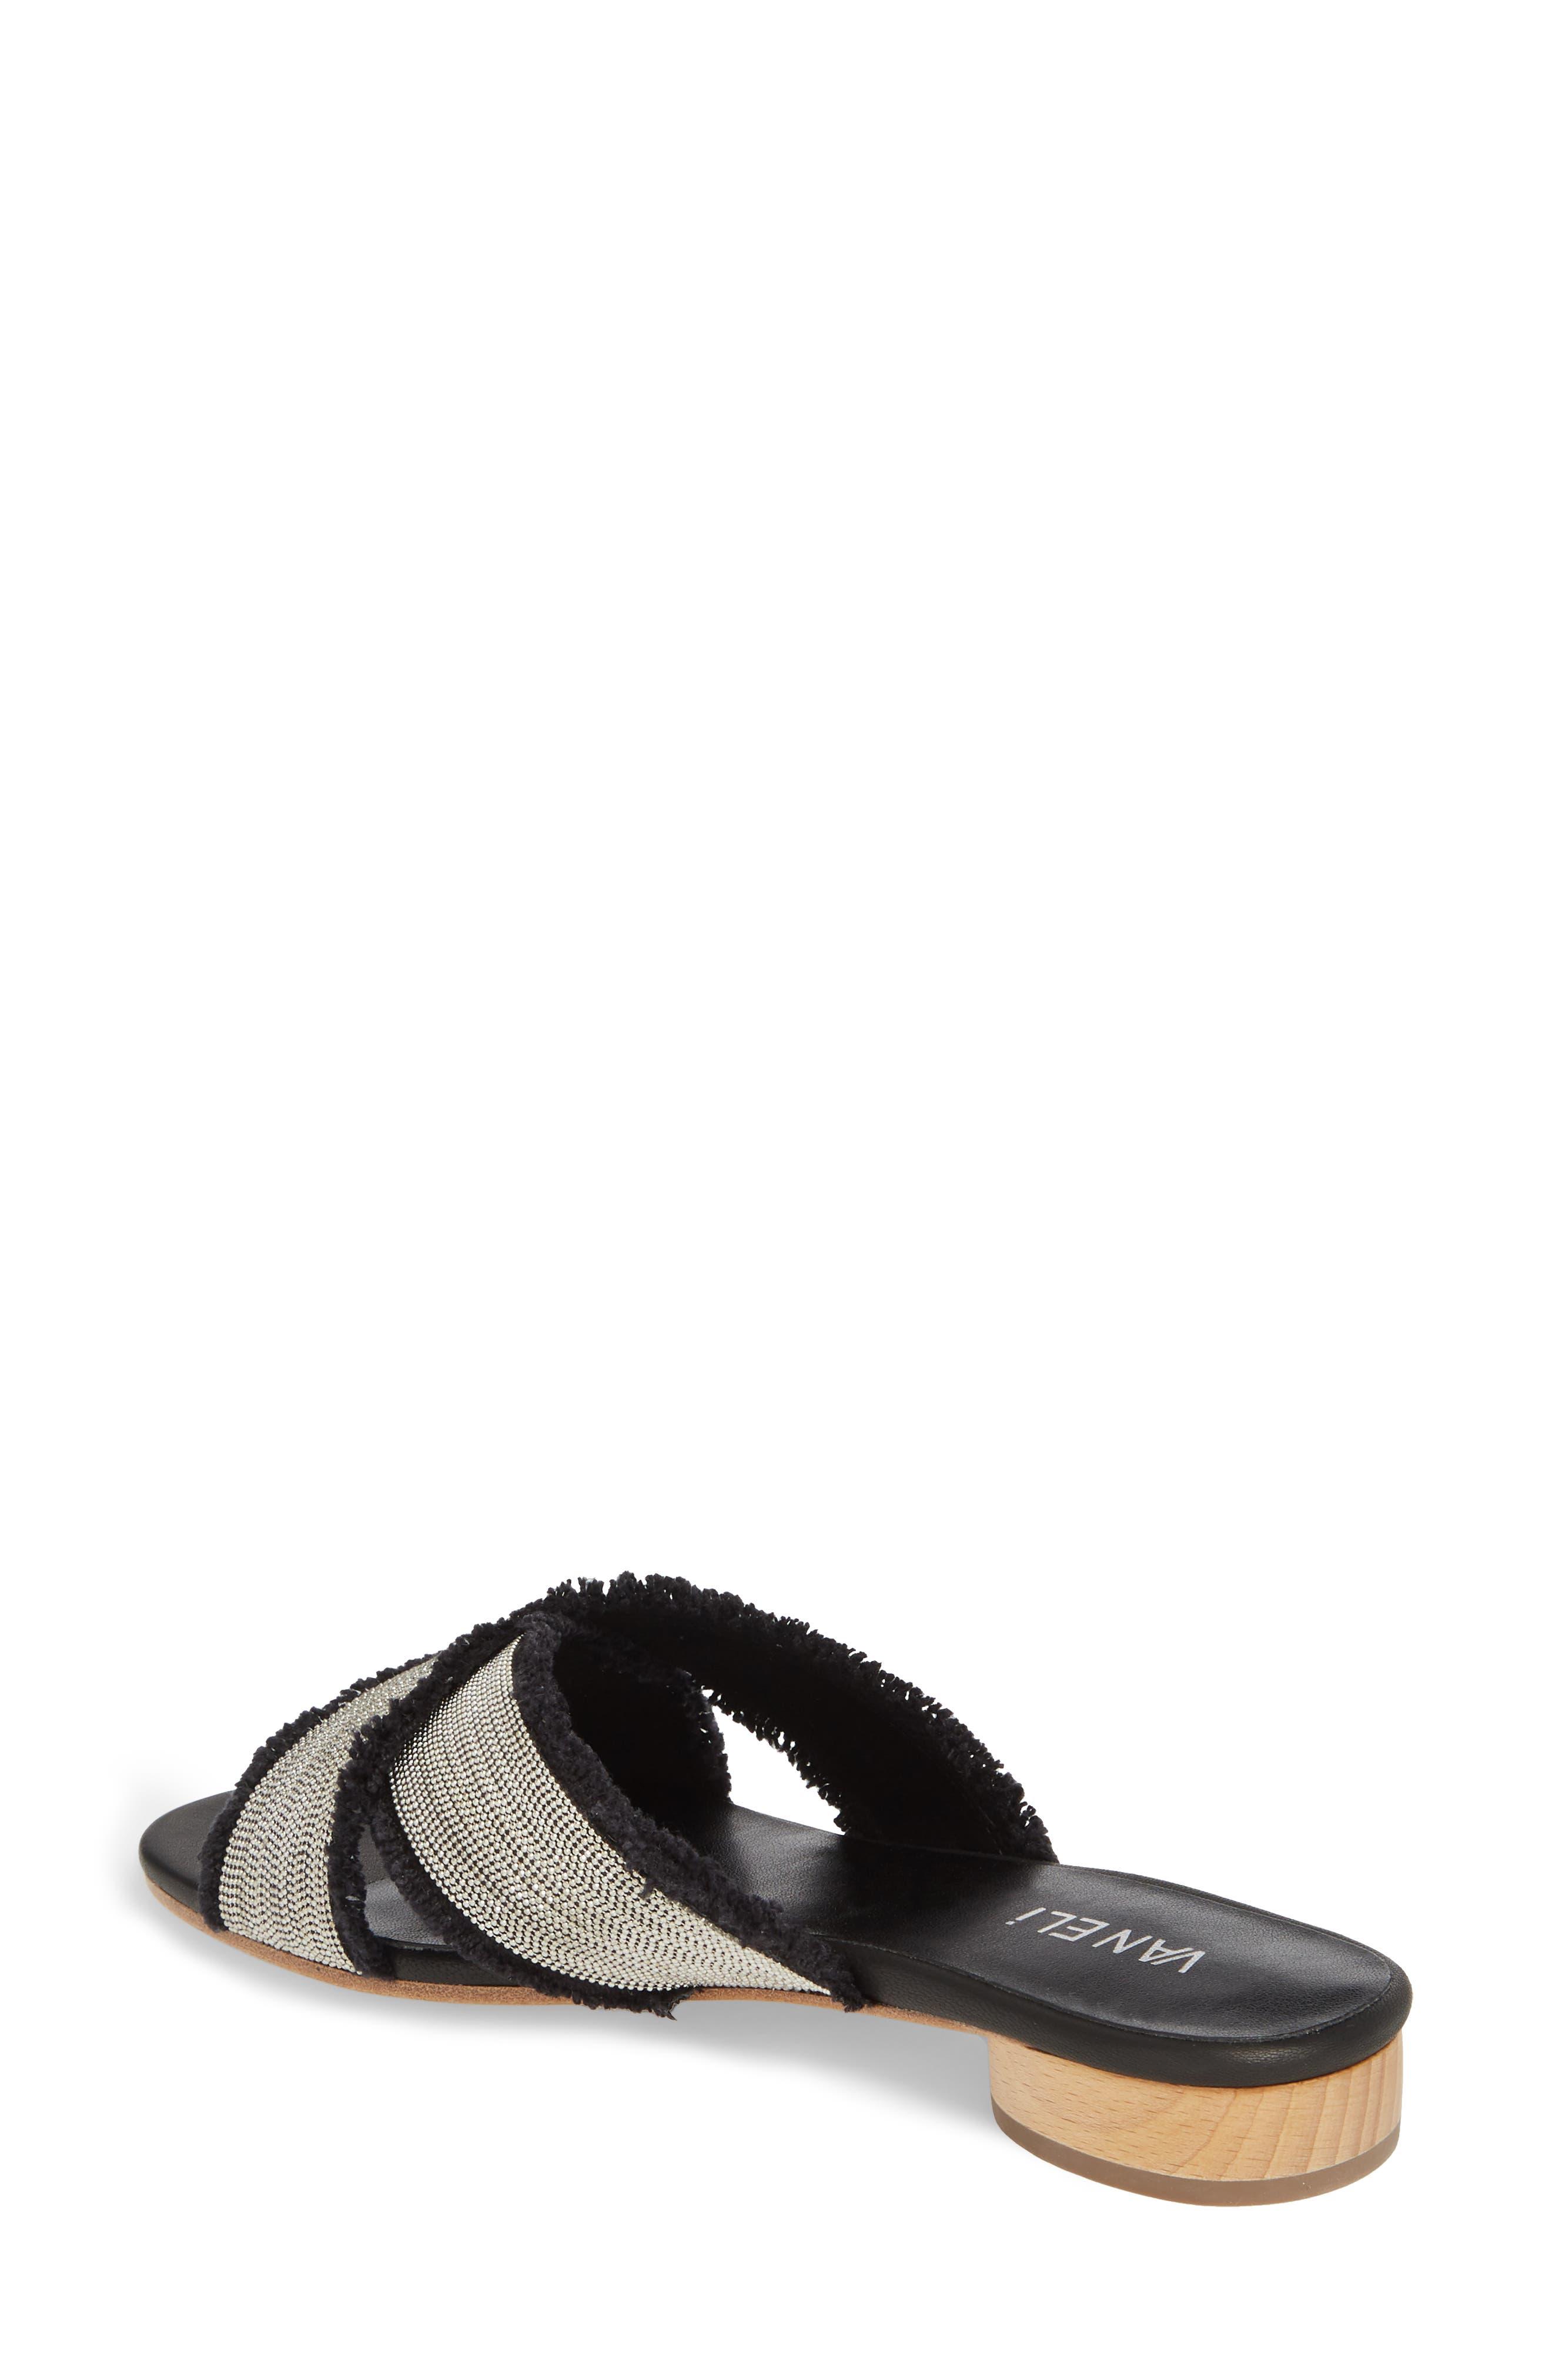 Baret Embellished Cross Strap Slide Sandal,                             Alternate thumbnail 2, color,                             BLACK FABRIC